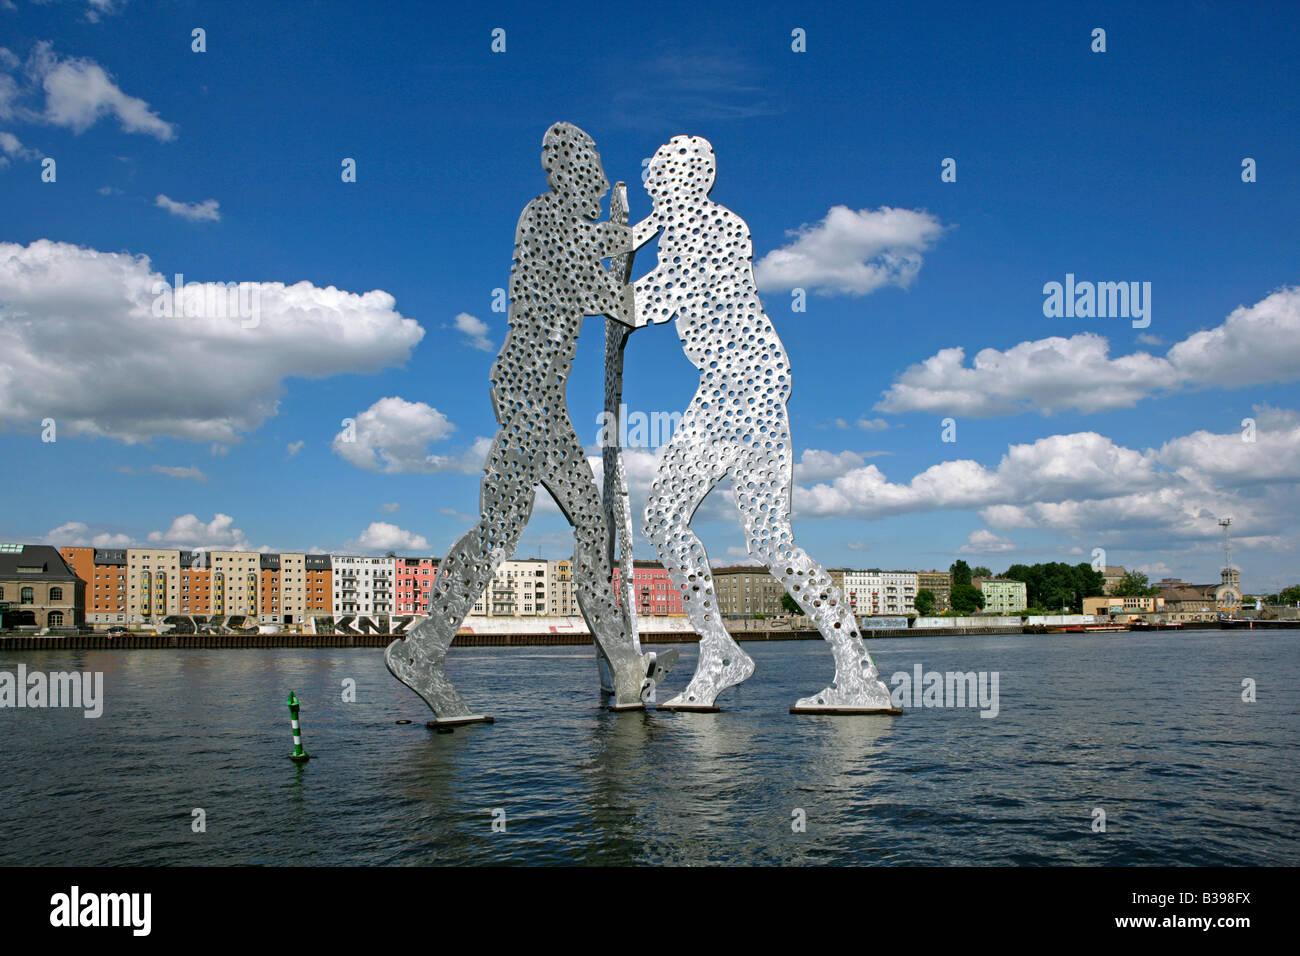 Deutschland, Berlin, Molecule Man, molecule man, sculpture by Borofsky, Berlin, Germany - Stock Image